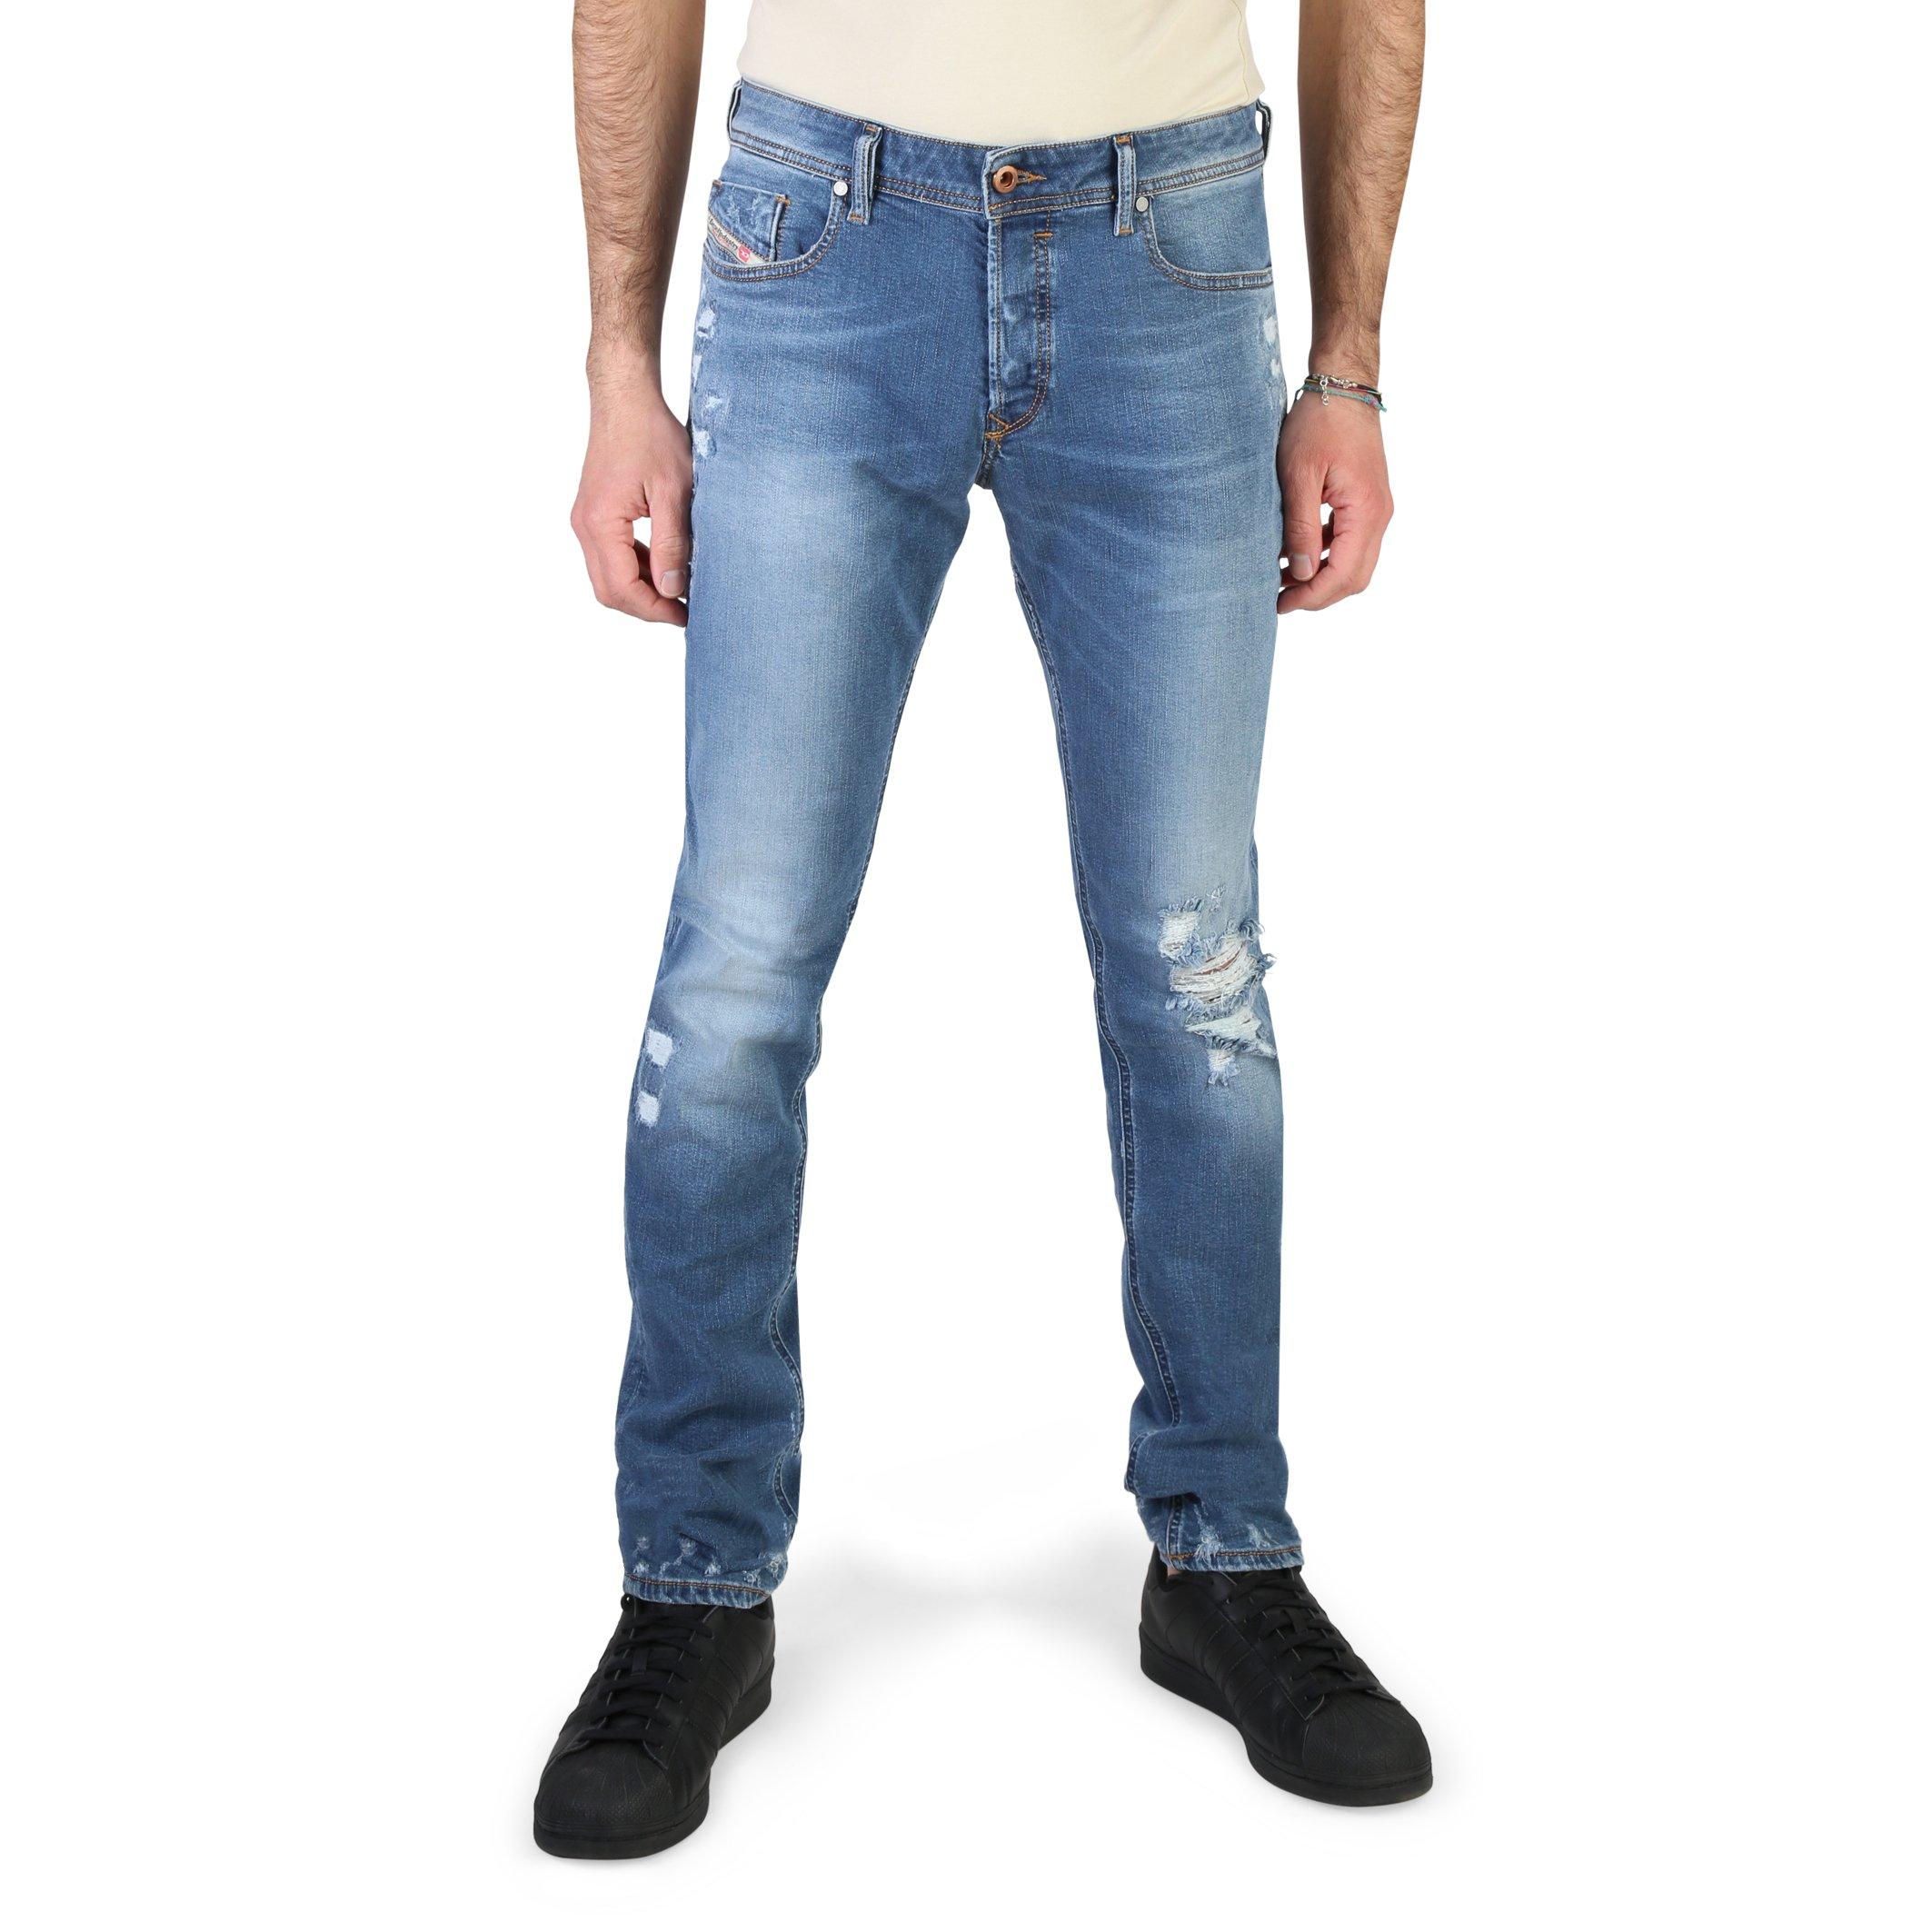 Diesel Men's Jeans Blue SLEENKER_L32_00S7VG - blue-2 30